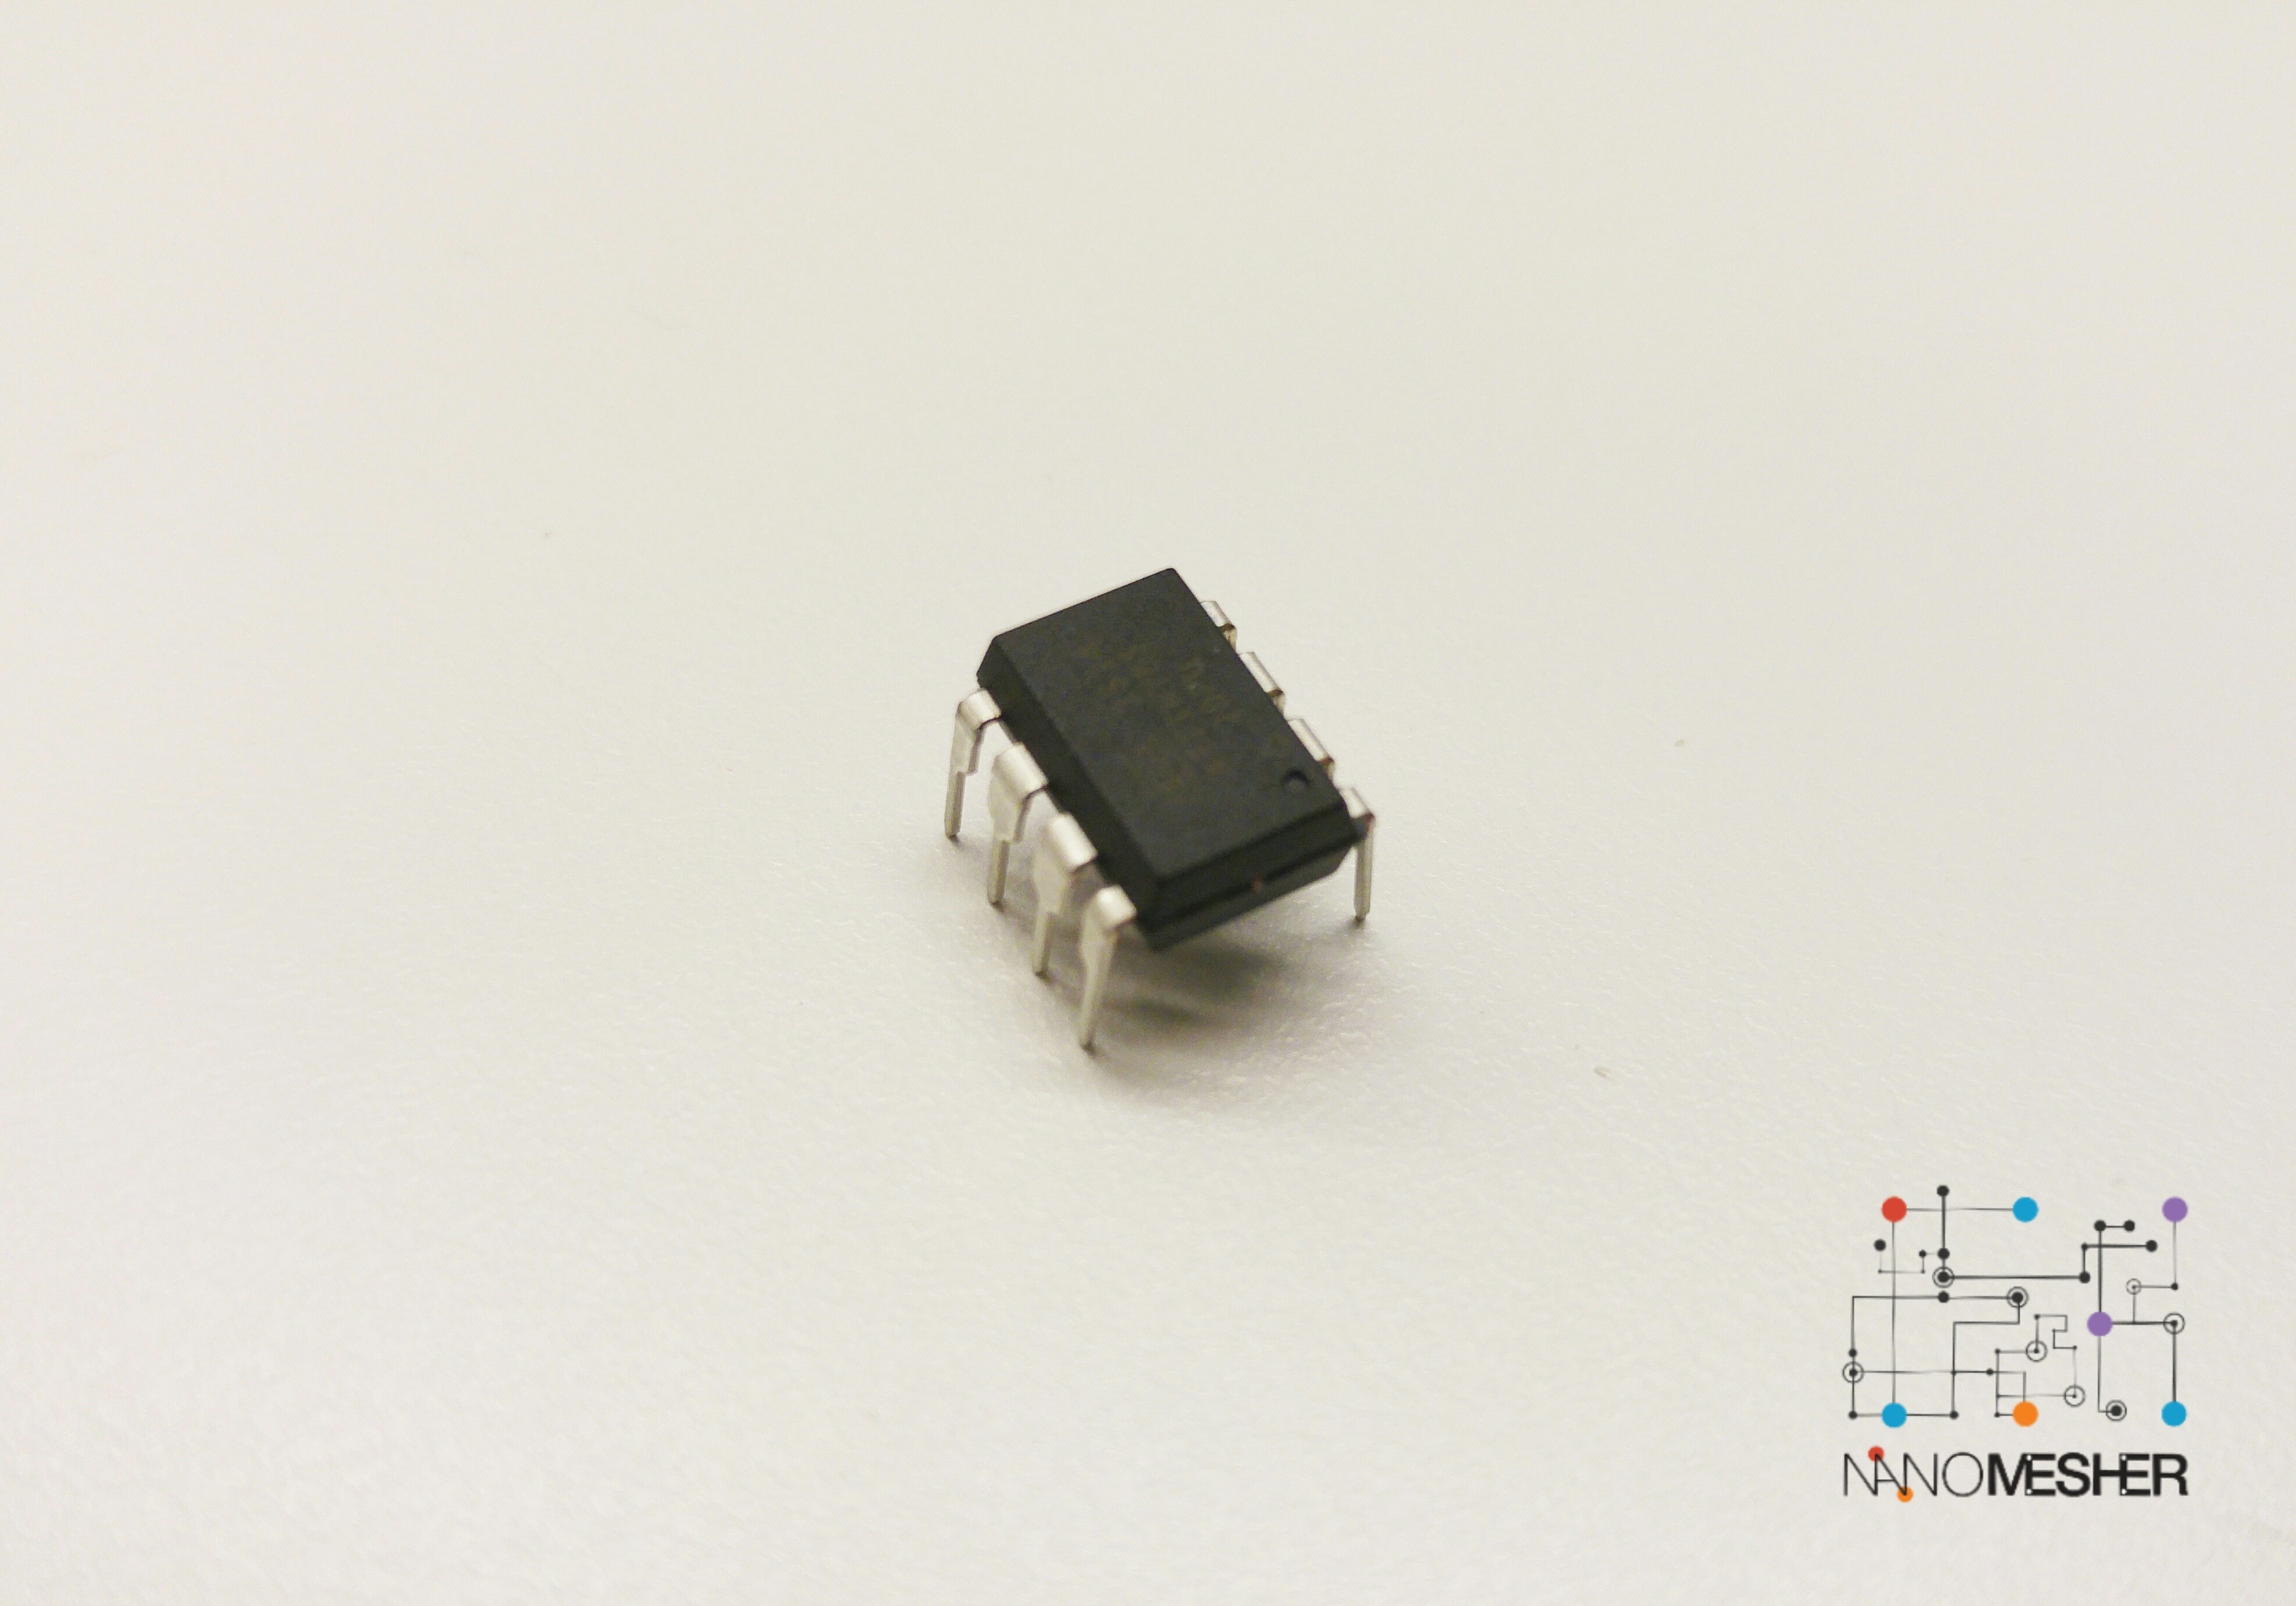 Attiny85 Microcontroller - DIP-8 Package ATT85